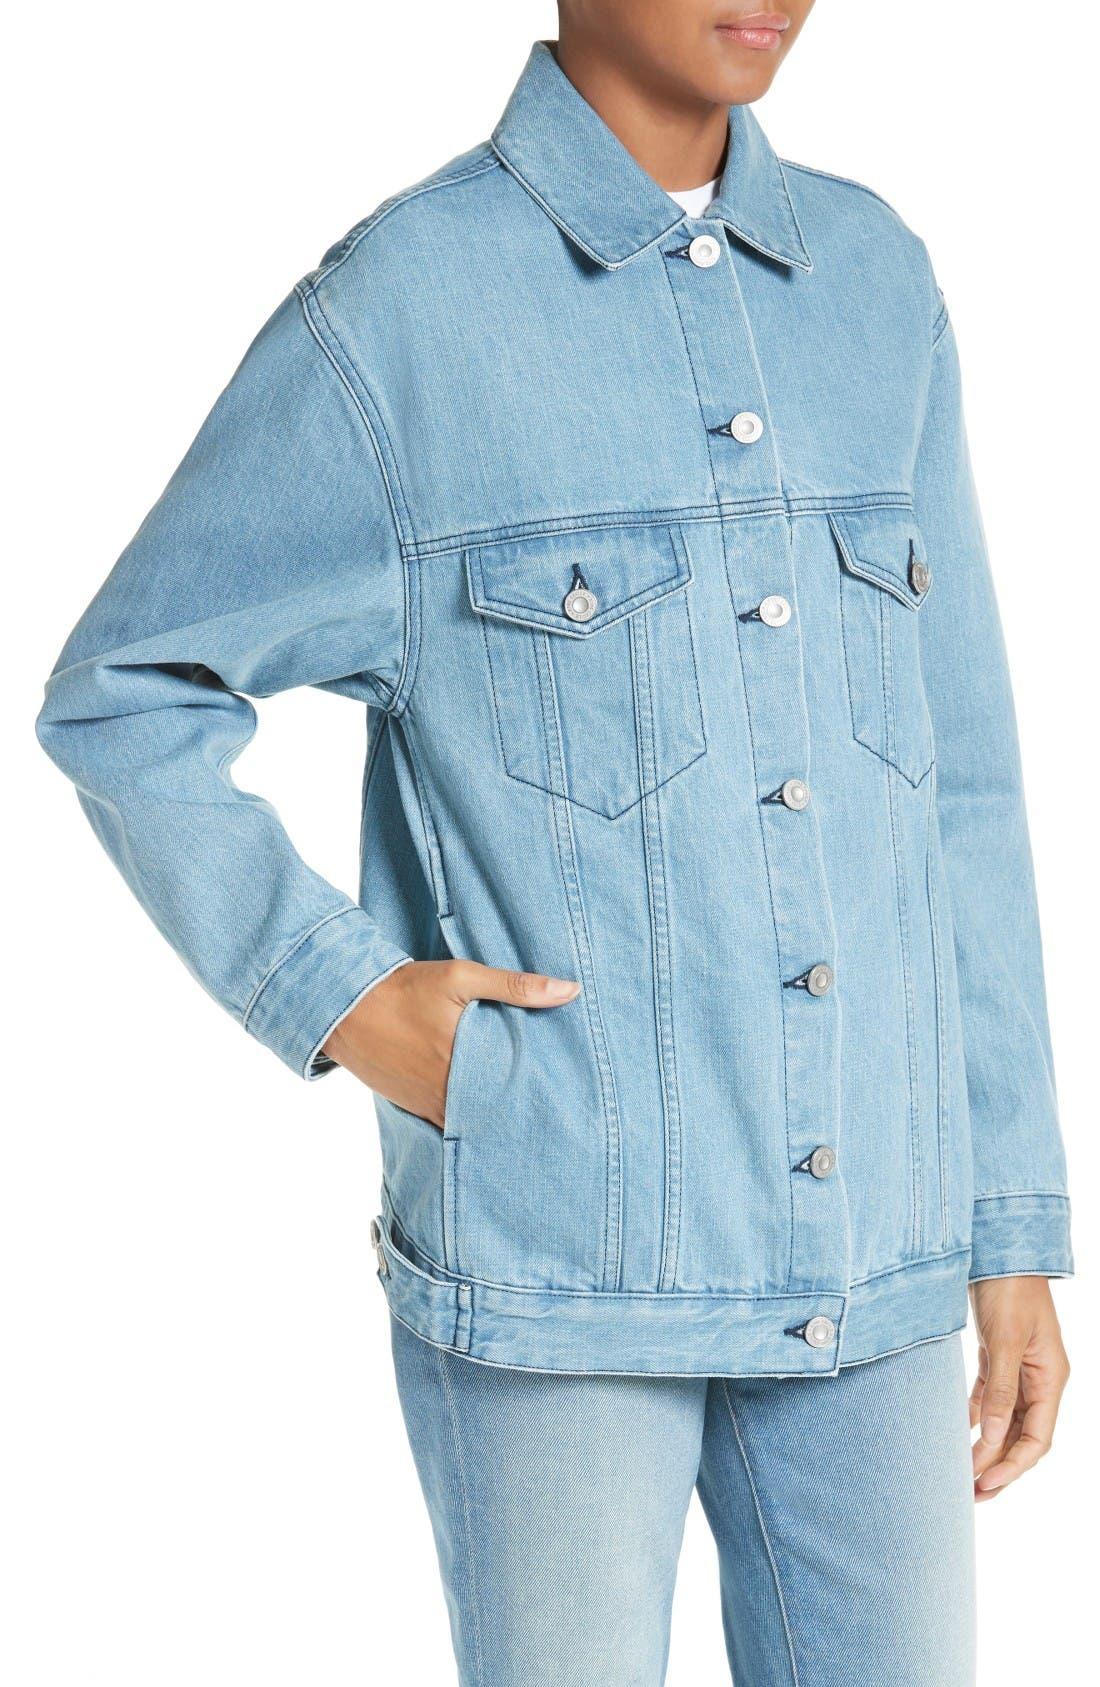 Alternate Image 4  - être cécile L'Avenue des Stars Embroidered Denim Jacket